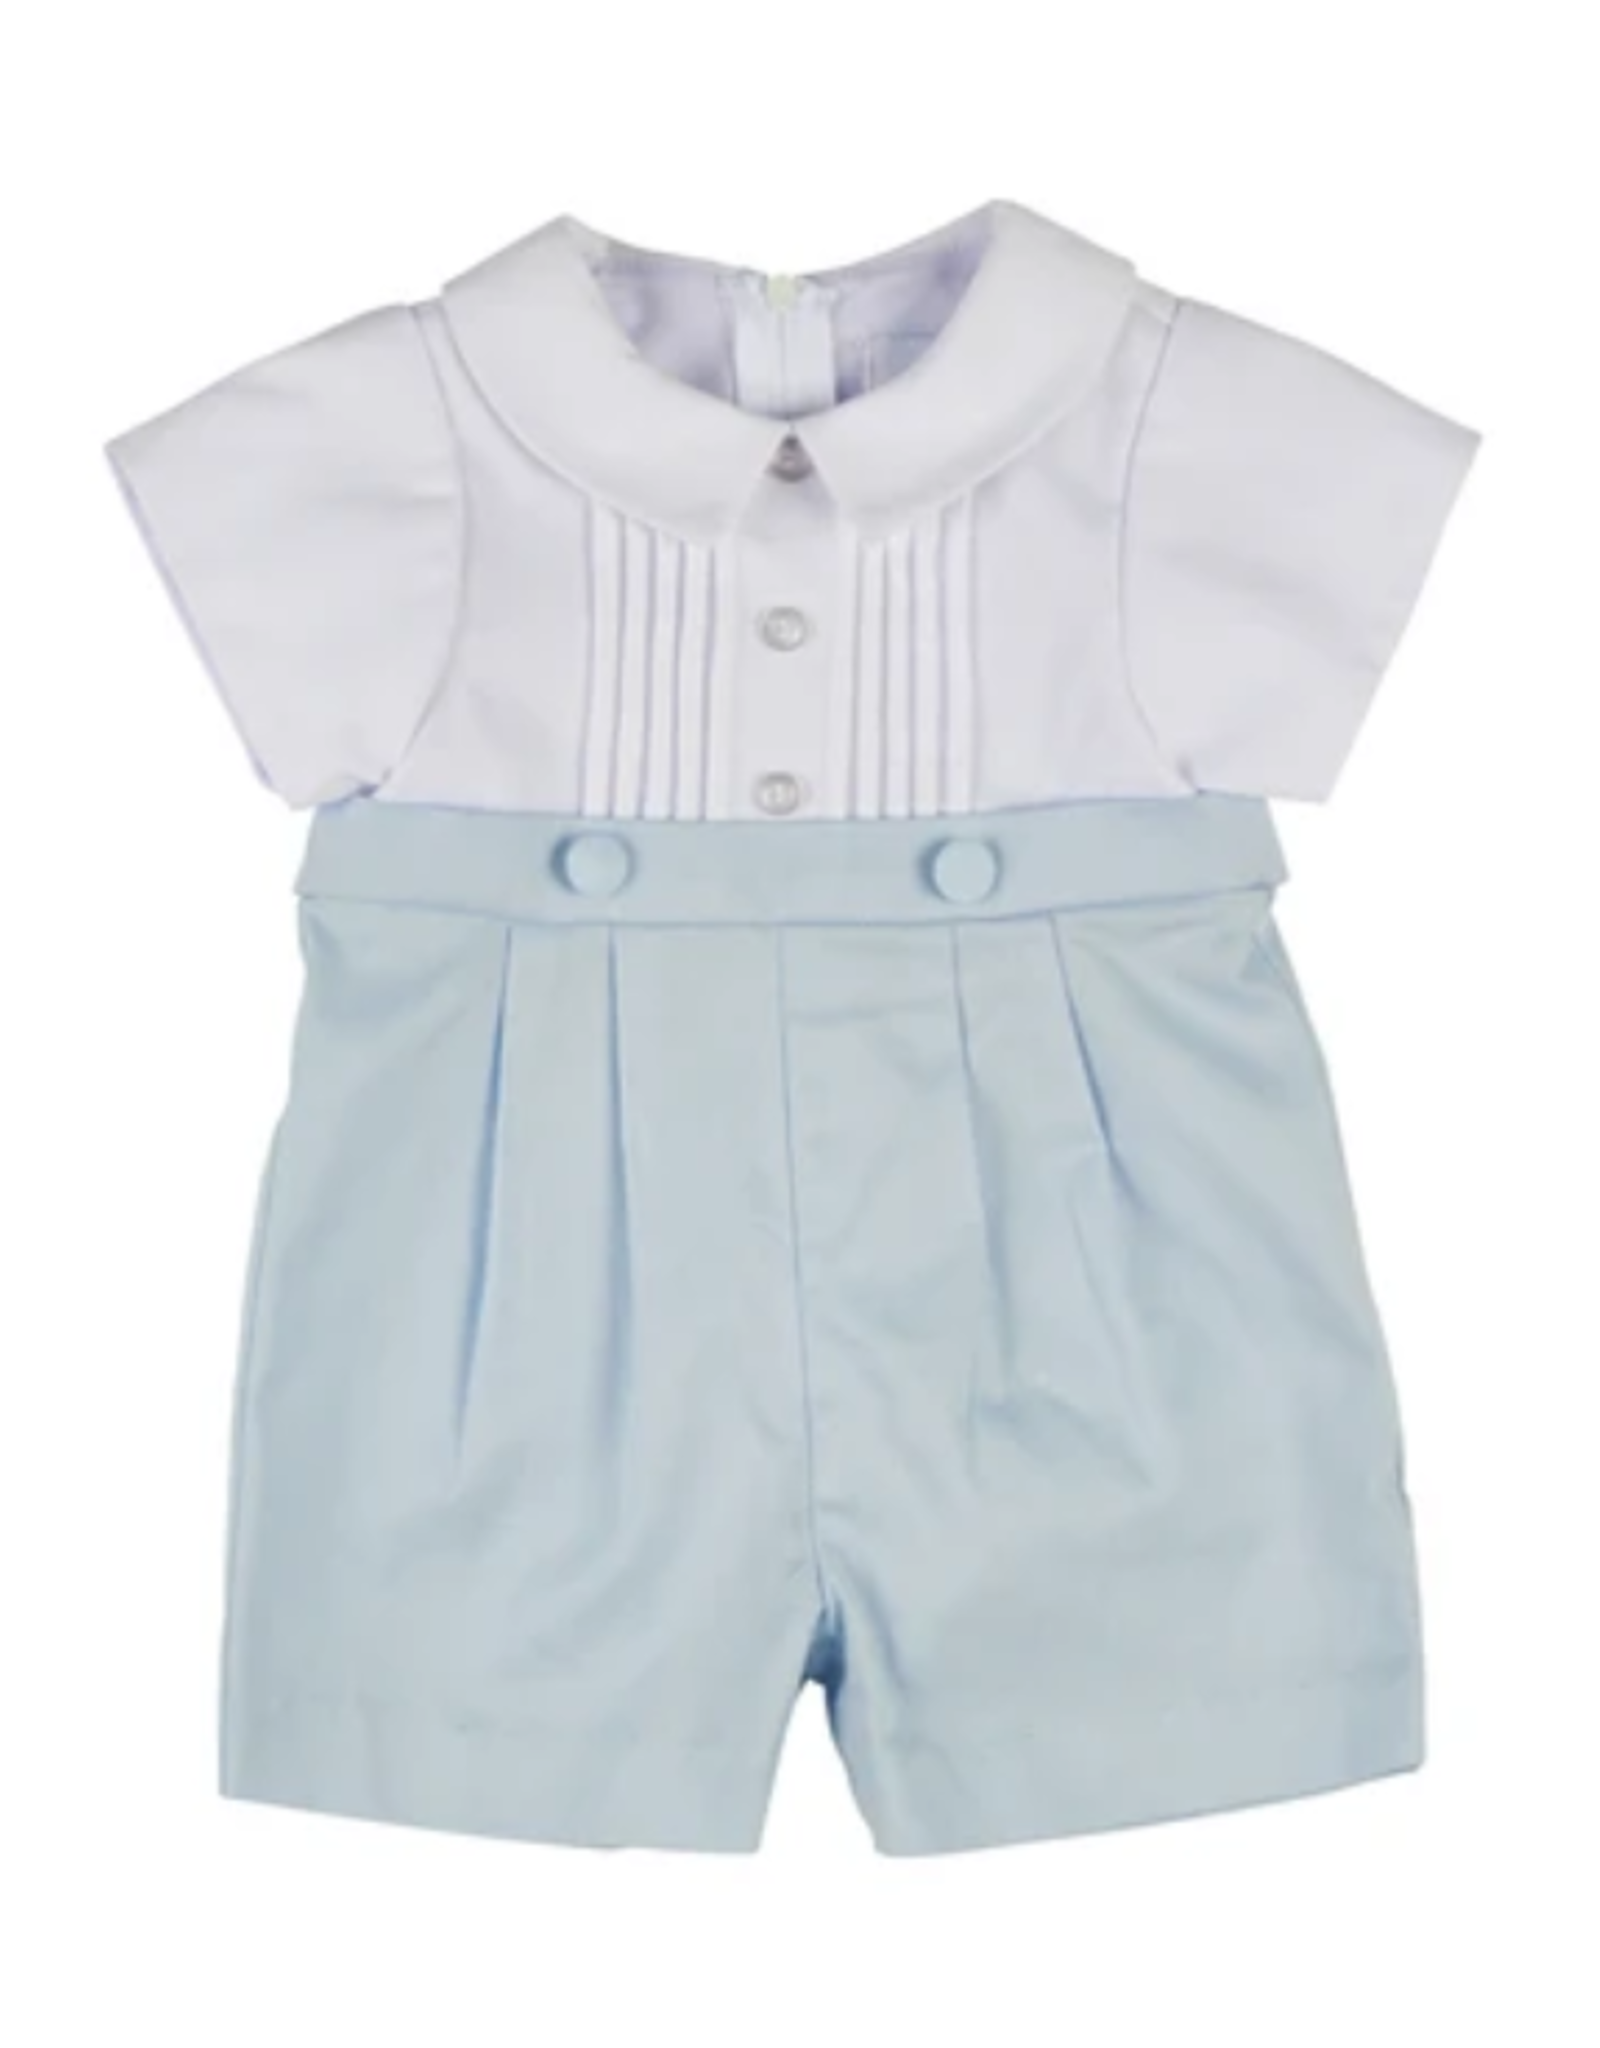 Florence Eiseman Boys shortall white/blue